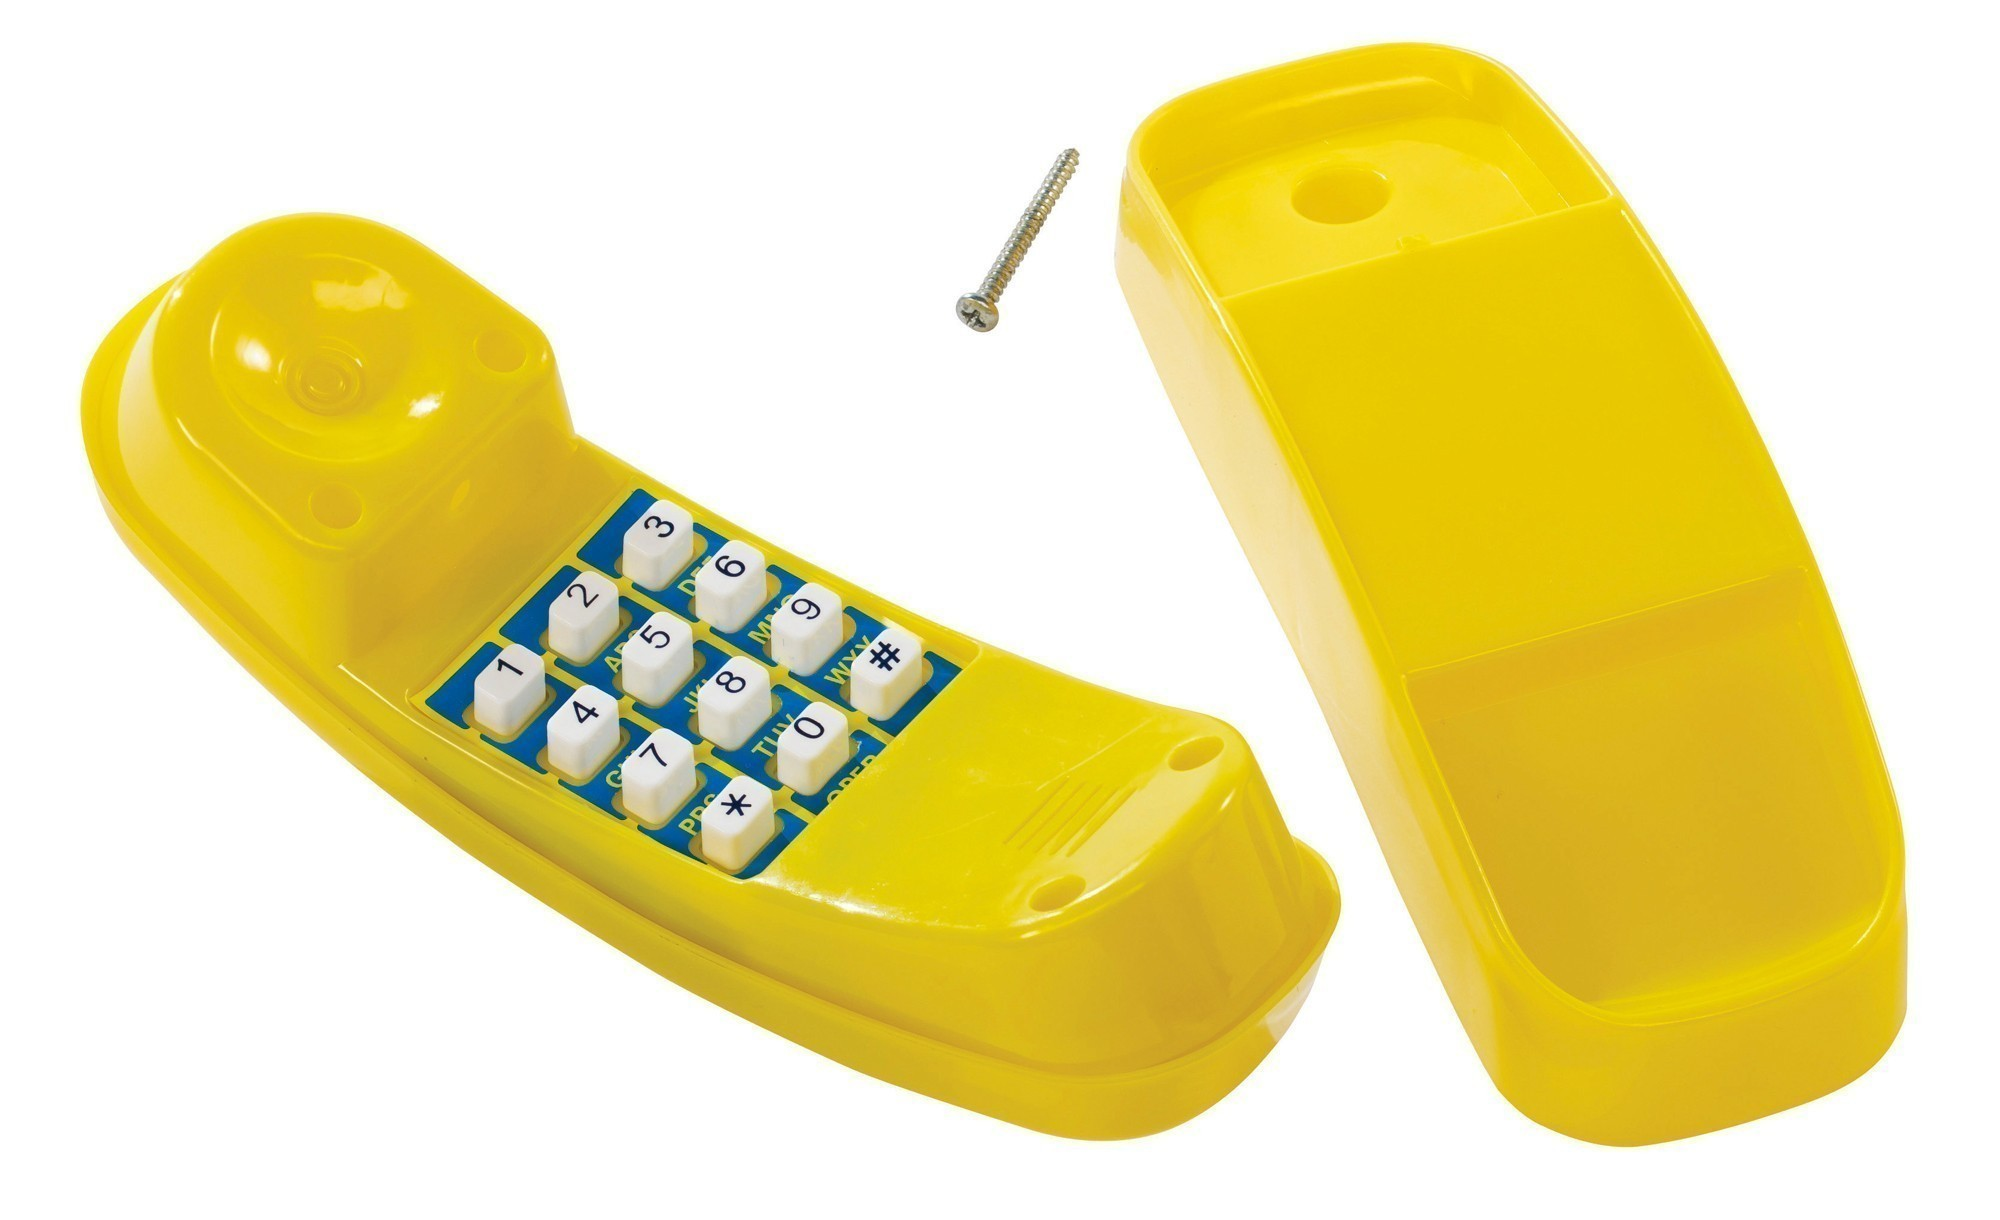 Kinder - Telefon gelb Bild 1